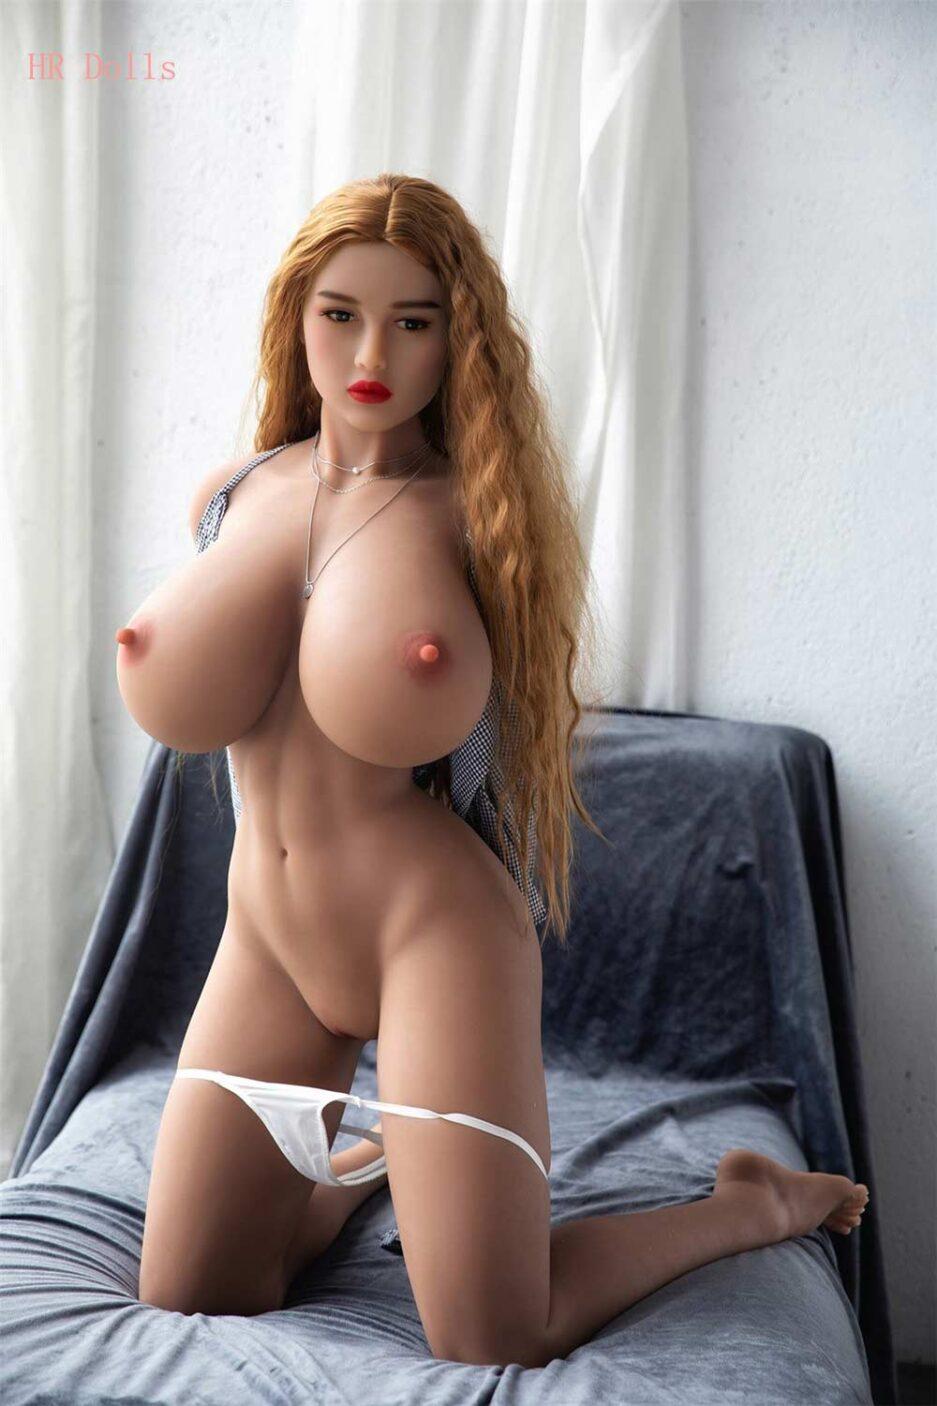 Kneeling busty sex doll